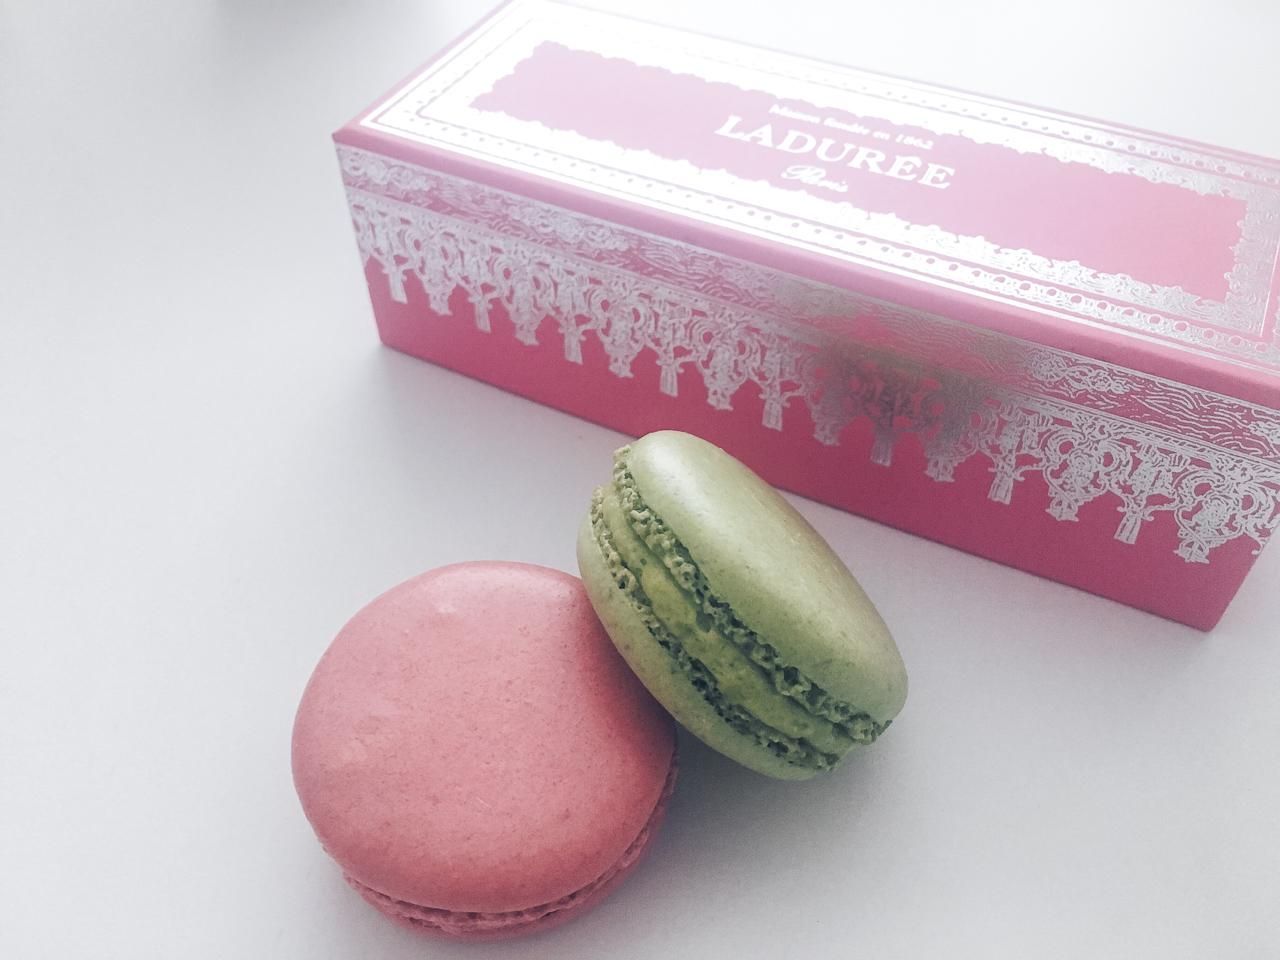 Laduree, macaron, Paris